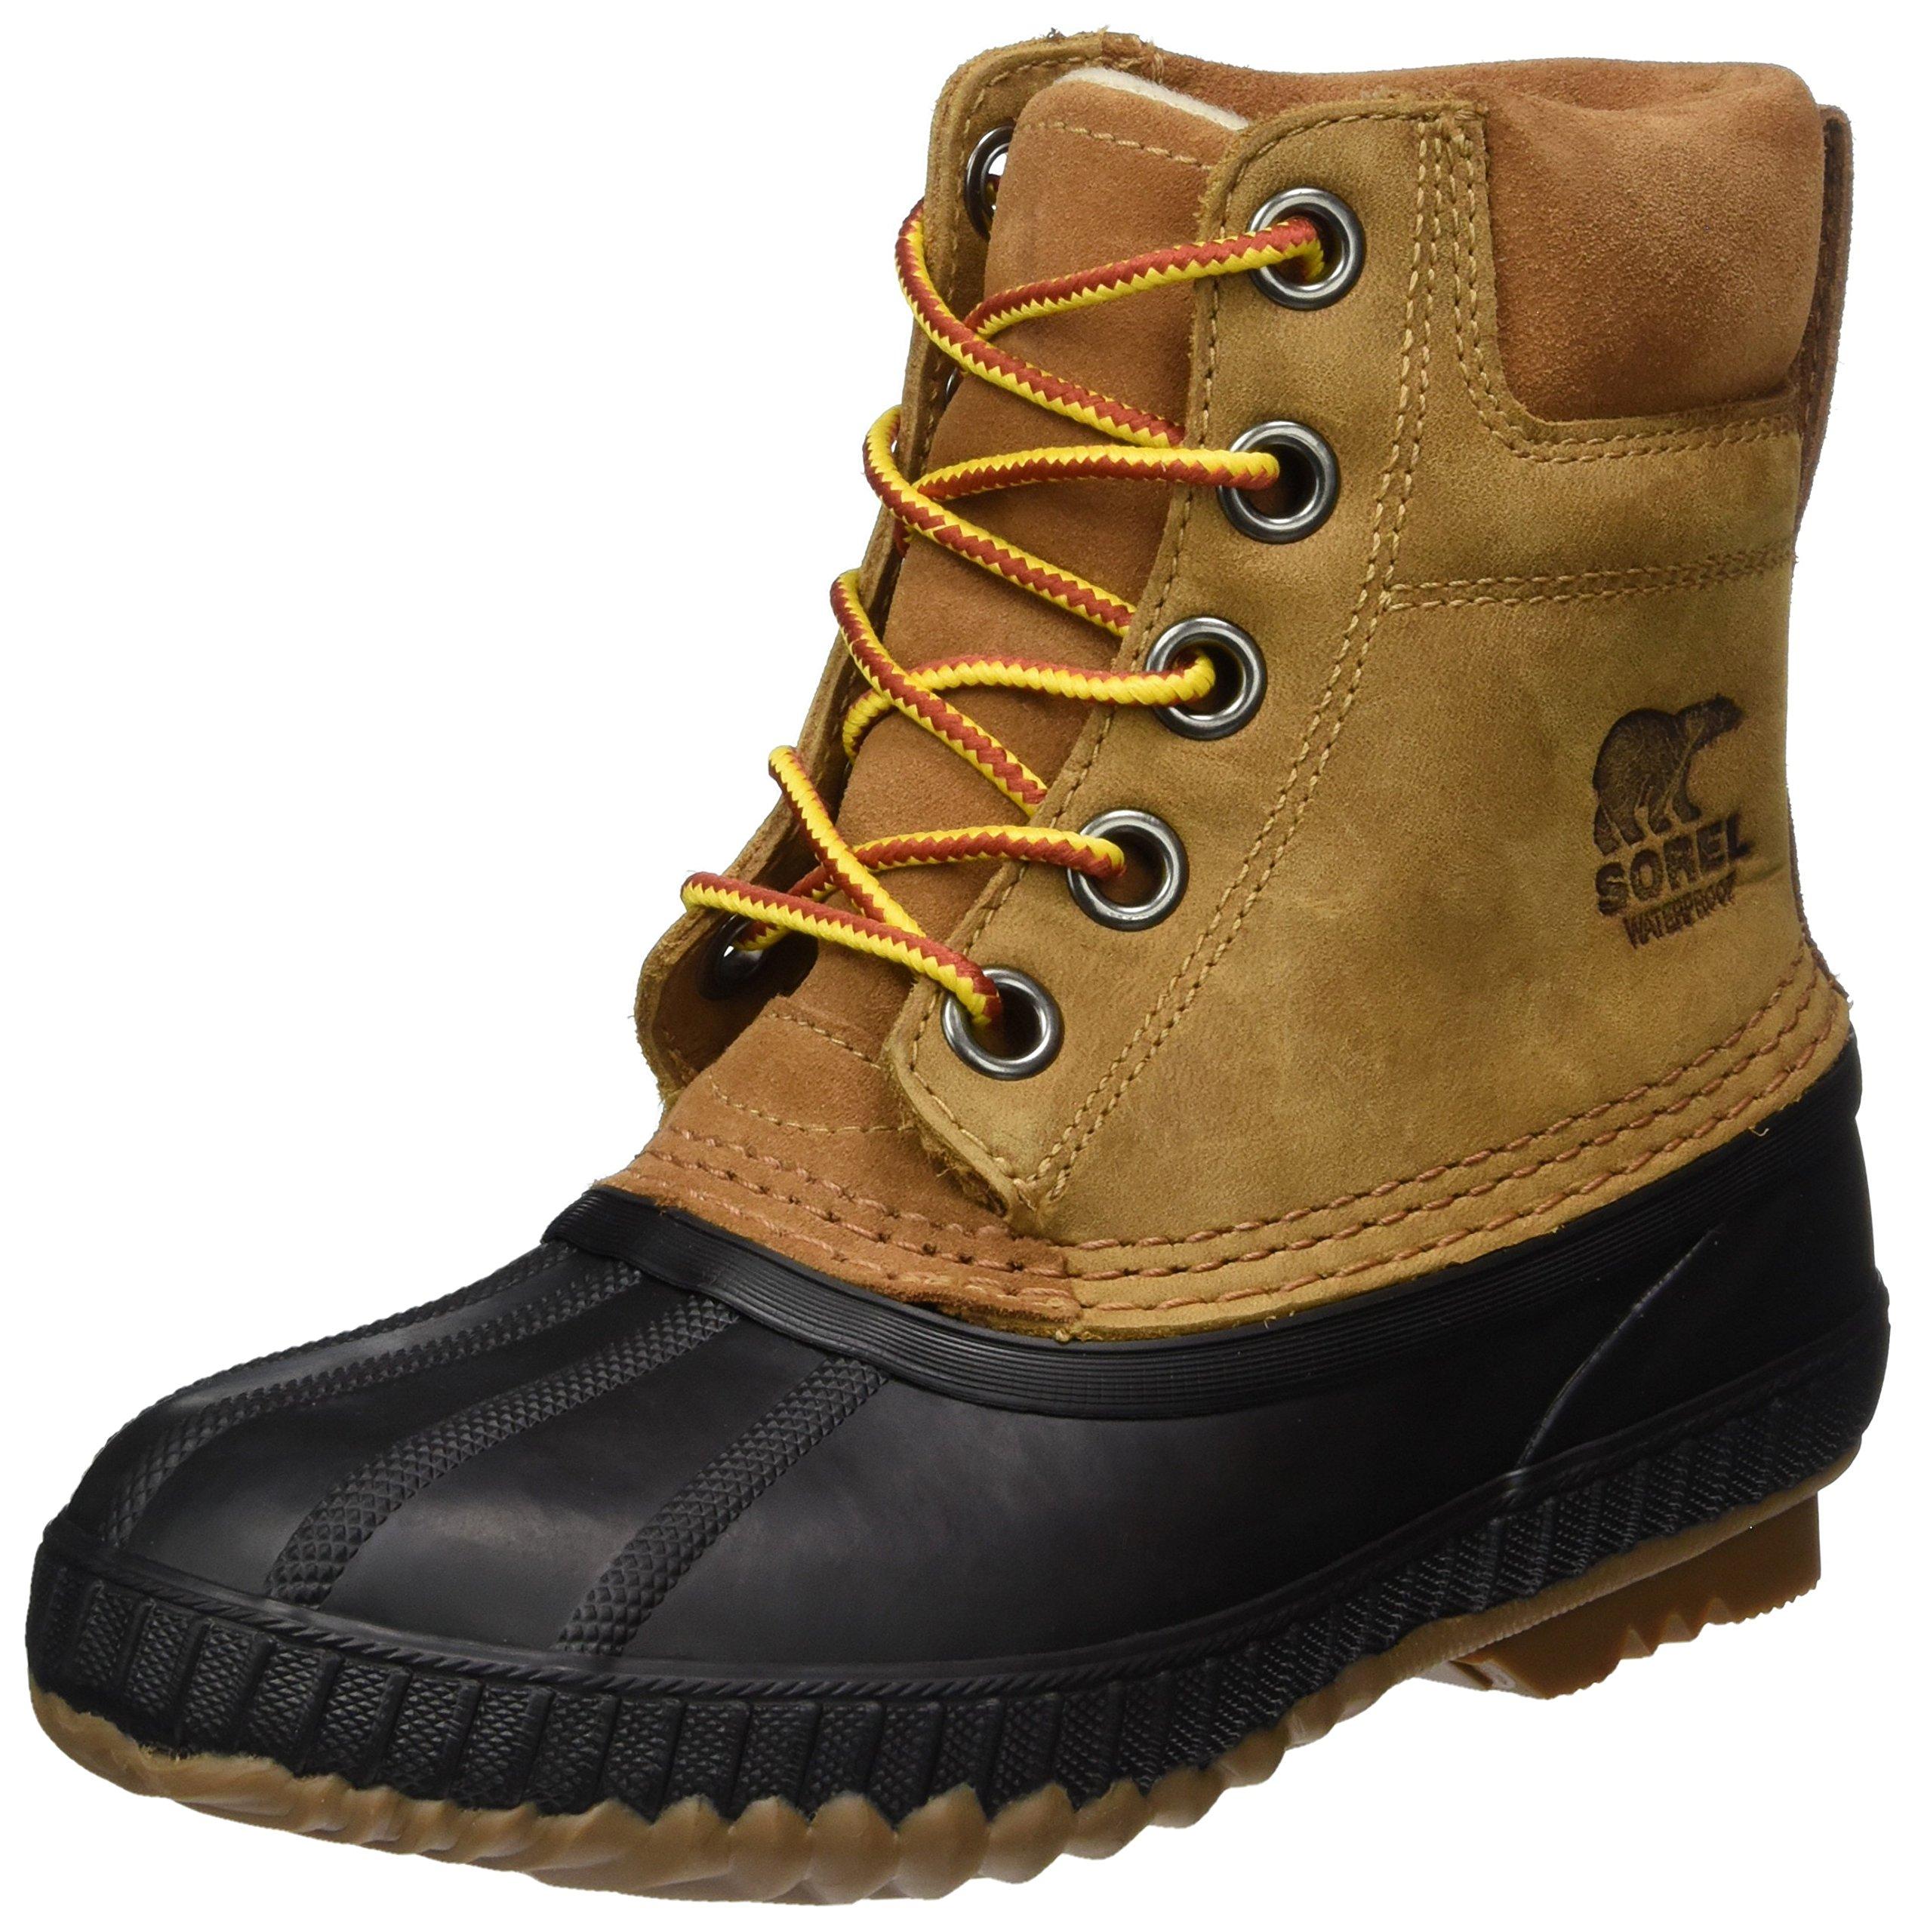 SOREL Boys' Youth Cheyanne II Lace Chukka Boot elk, Black 7 M US Big Kid